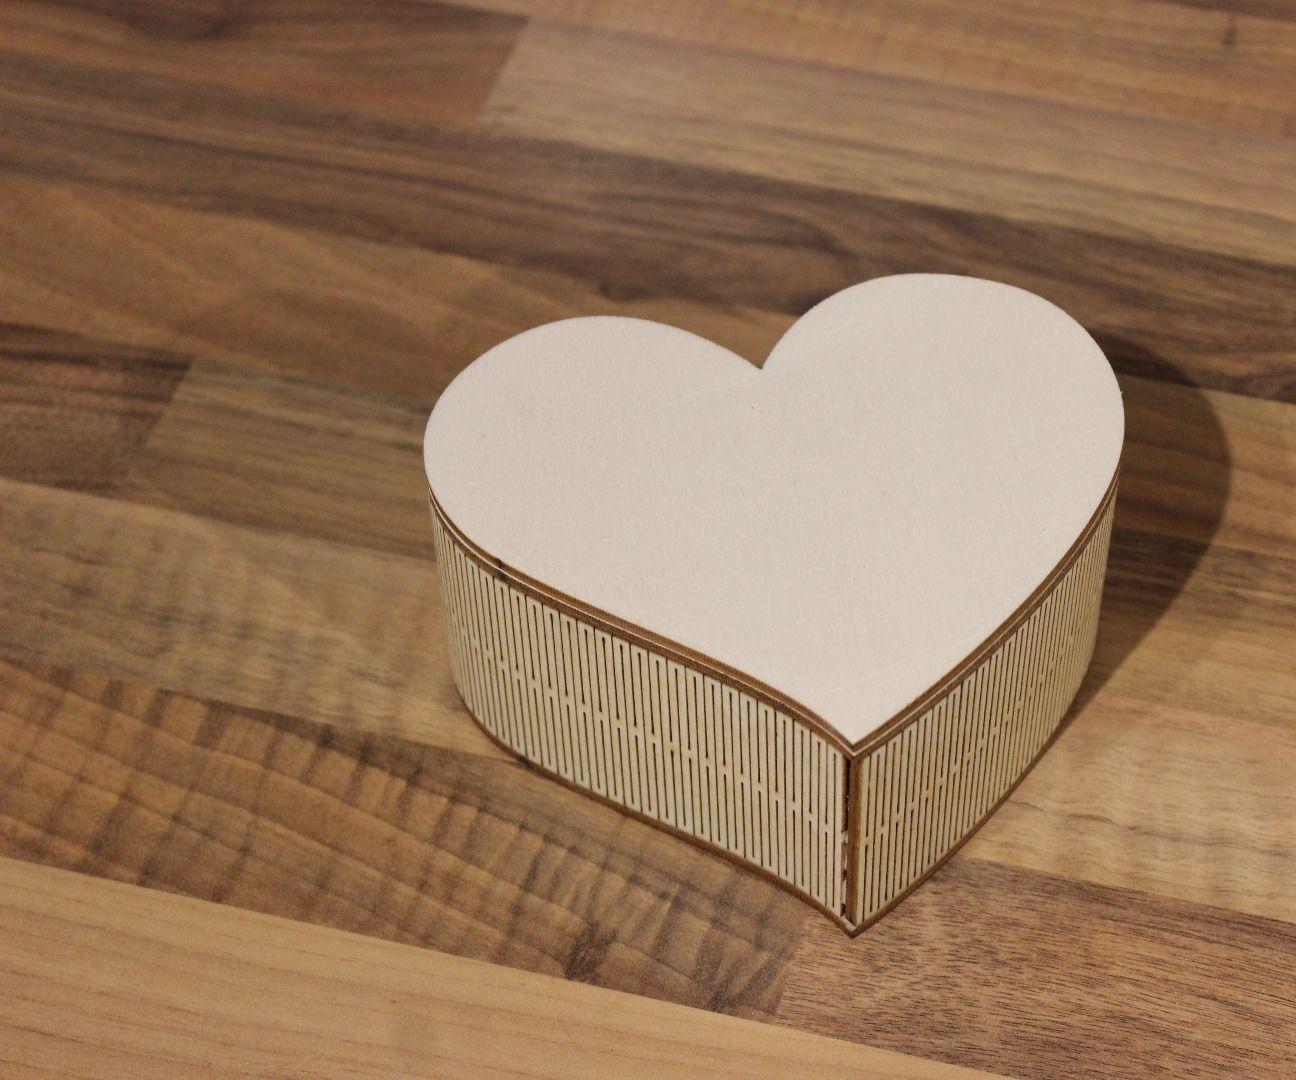 Laser Cut Heart Shaped Box